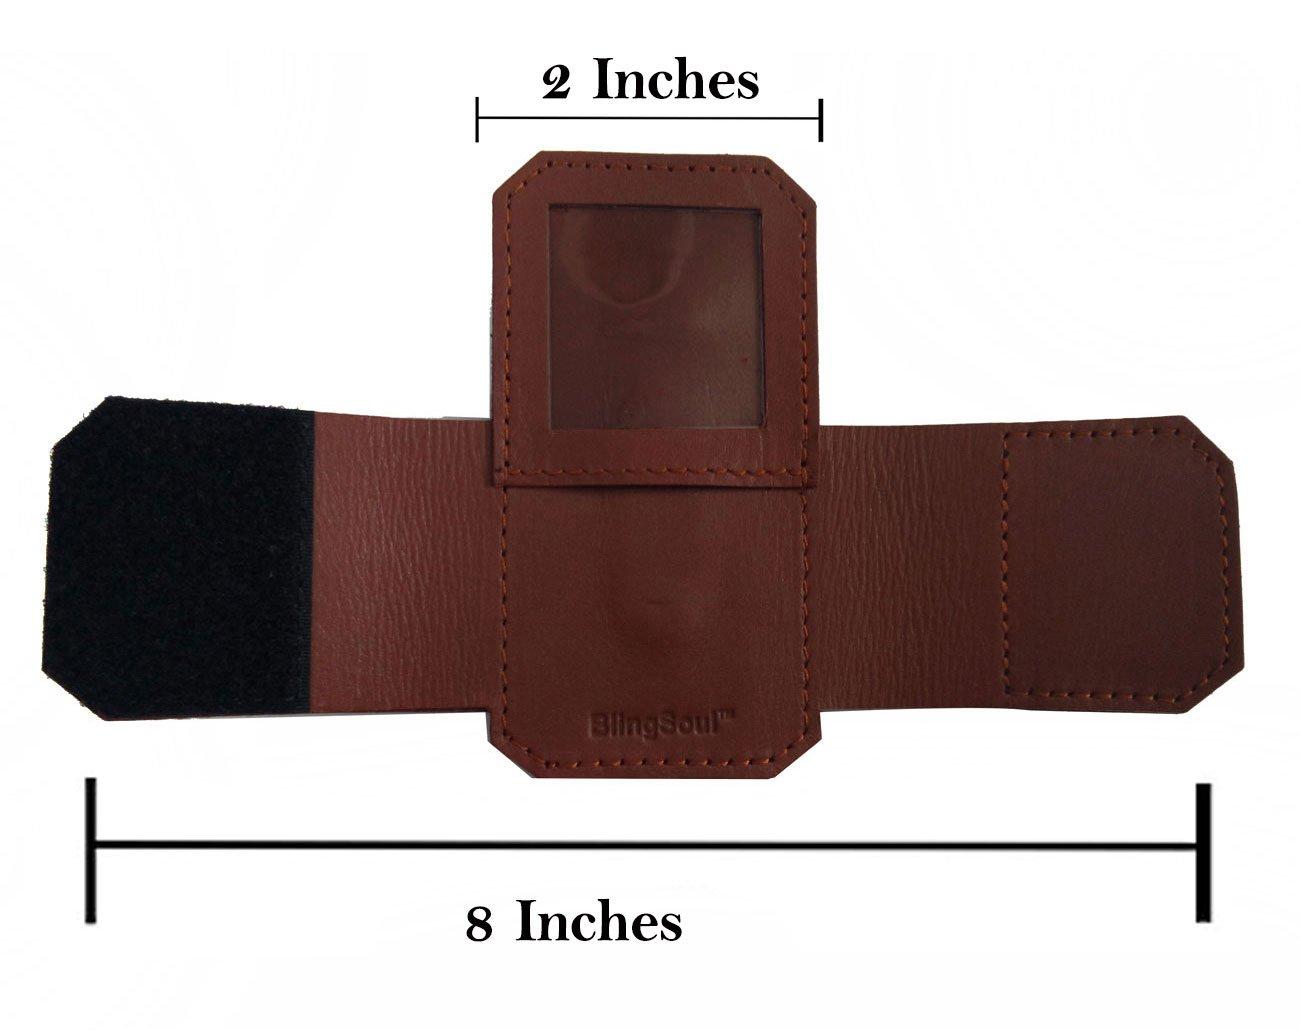 100% -Genuine Leather 3M Littmann Stethoscope Case for Women Men - MDF Adscope Stethoscope Holder Clip, Medical Nursing Accessories ADC Steth Holster Cover Kit for Nurse Cardiology Doctor (Brown) by BlingSoul (Image #2)